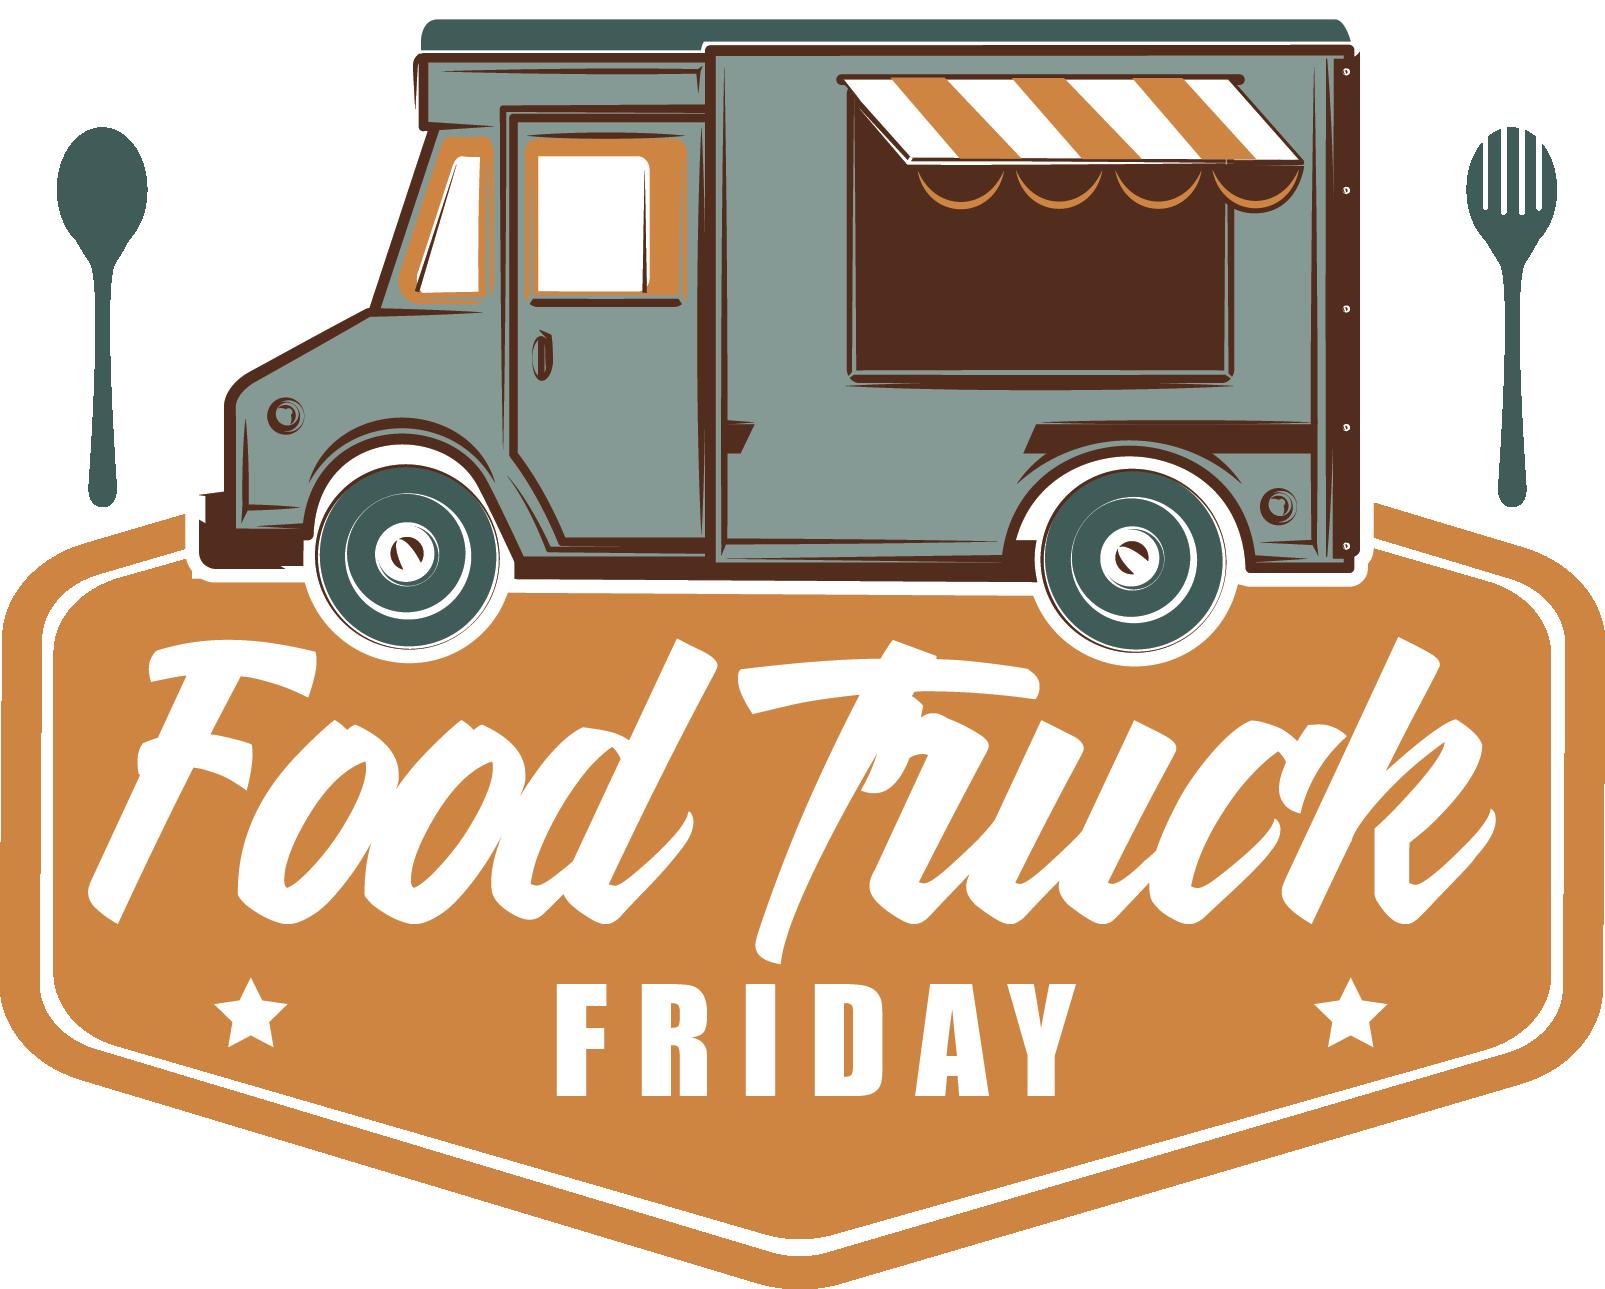 VO Food Truck Friday-1